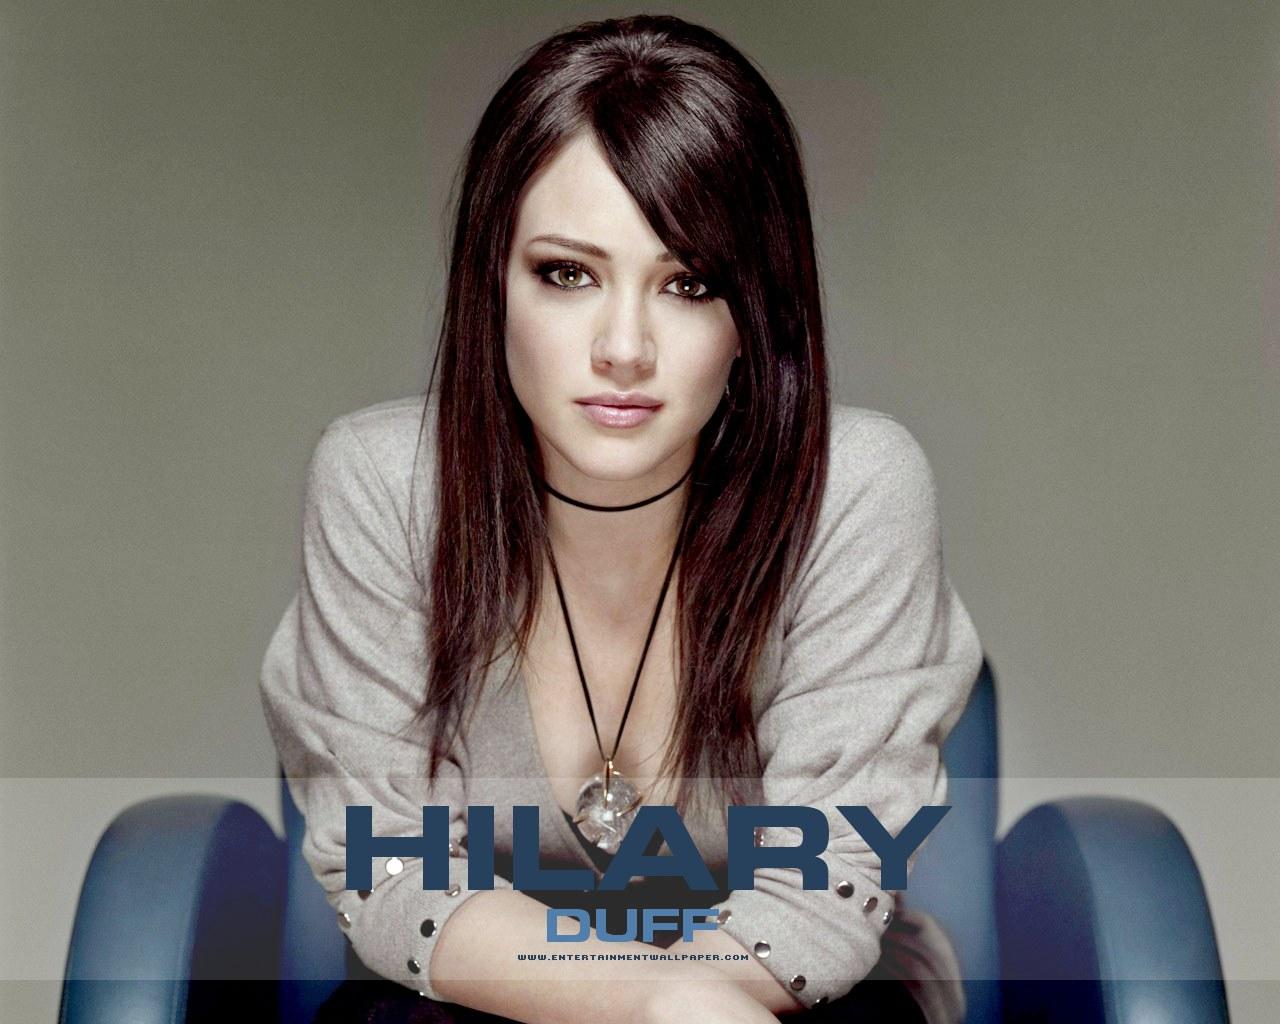 http://3.bp.blogspot.com/-BUkmj2io7zc/Top6tZEiHWI/AAAAAAAARL8/fajwAEzNwx4/s1600/Hilary-Duff_00.jpg